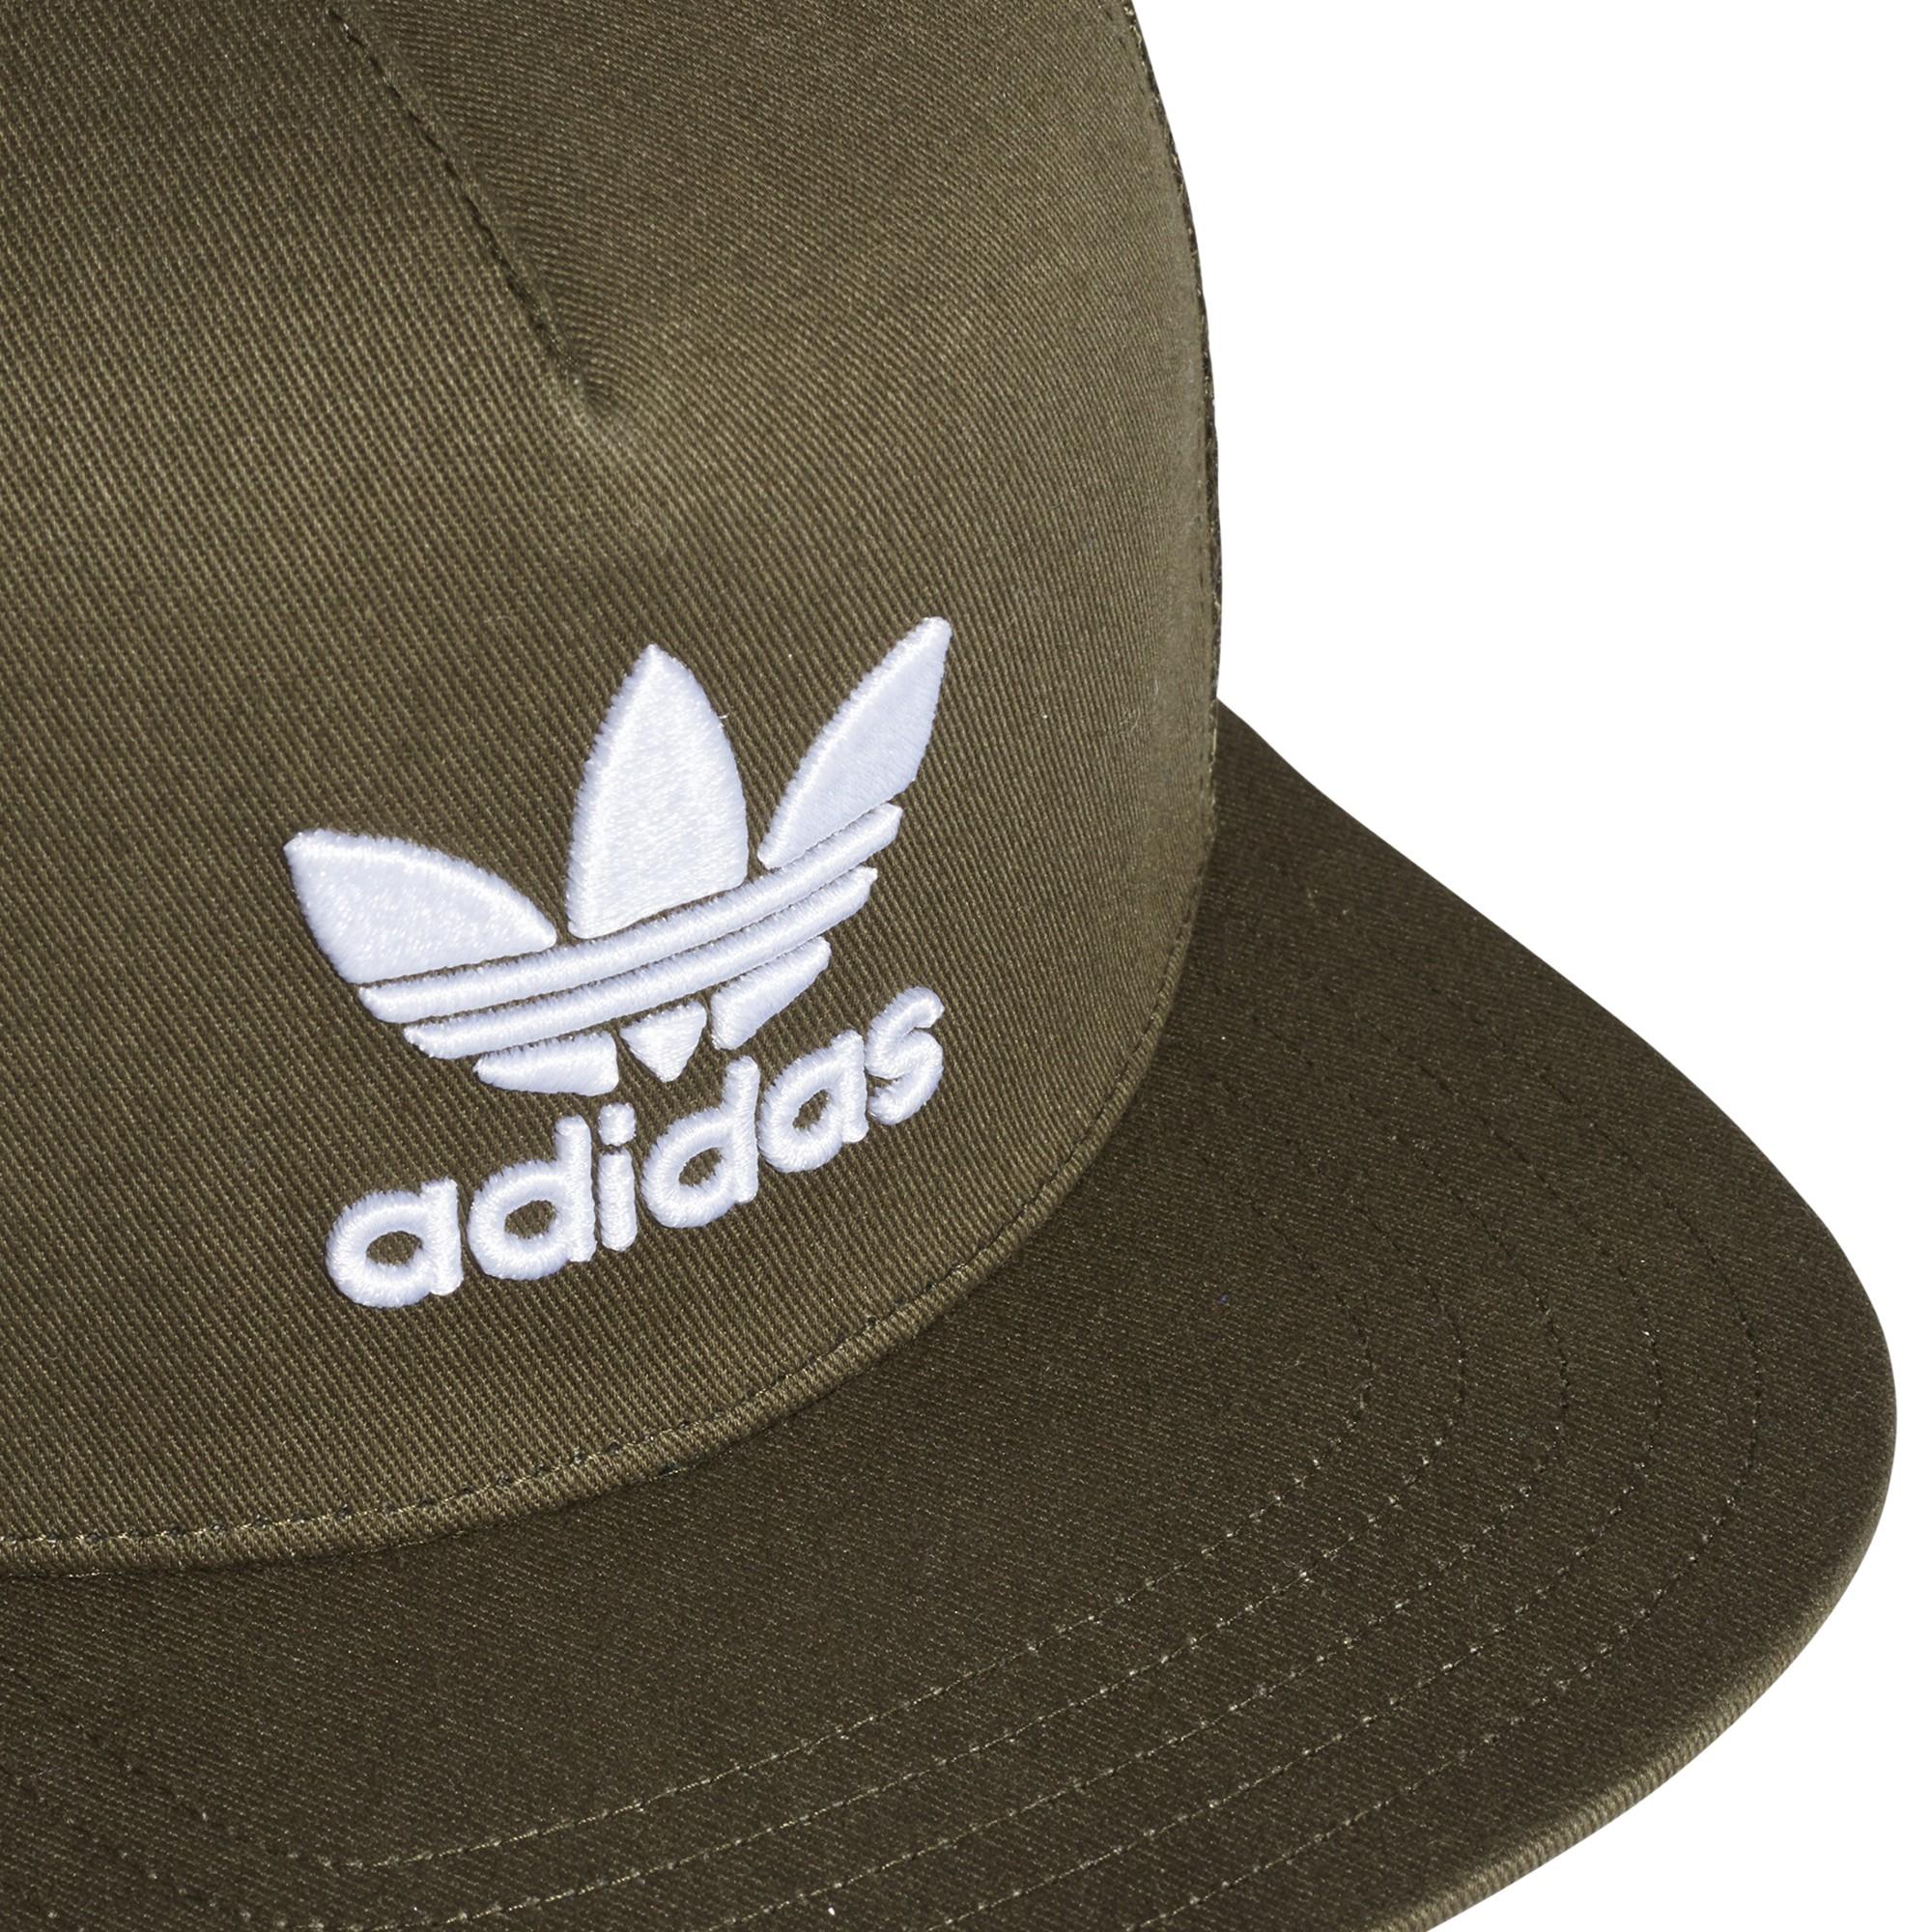 Comprar Gorra Adidas Trébol Verde Junior - Deportes Moya b3df848629f